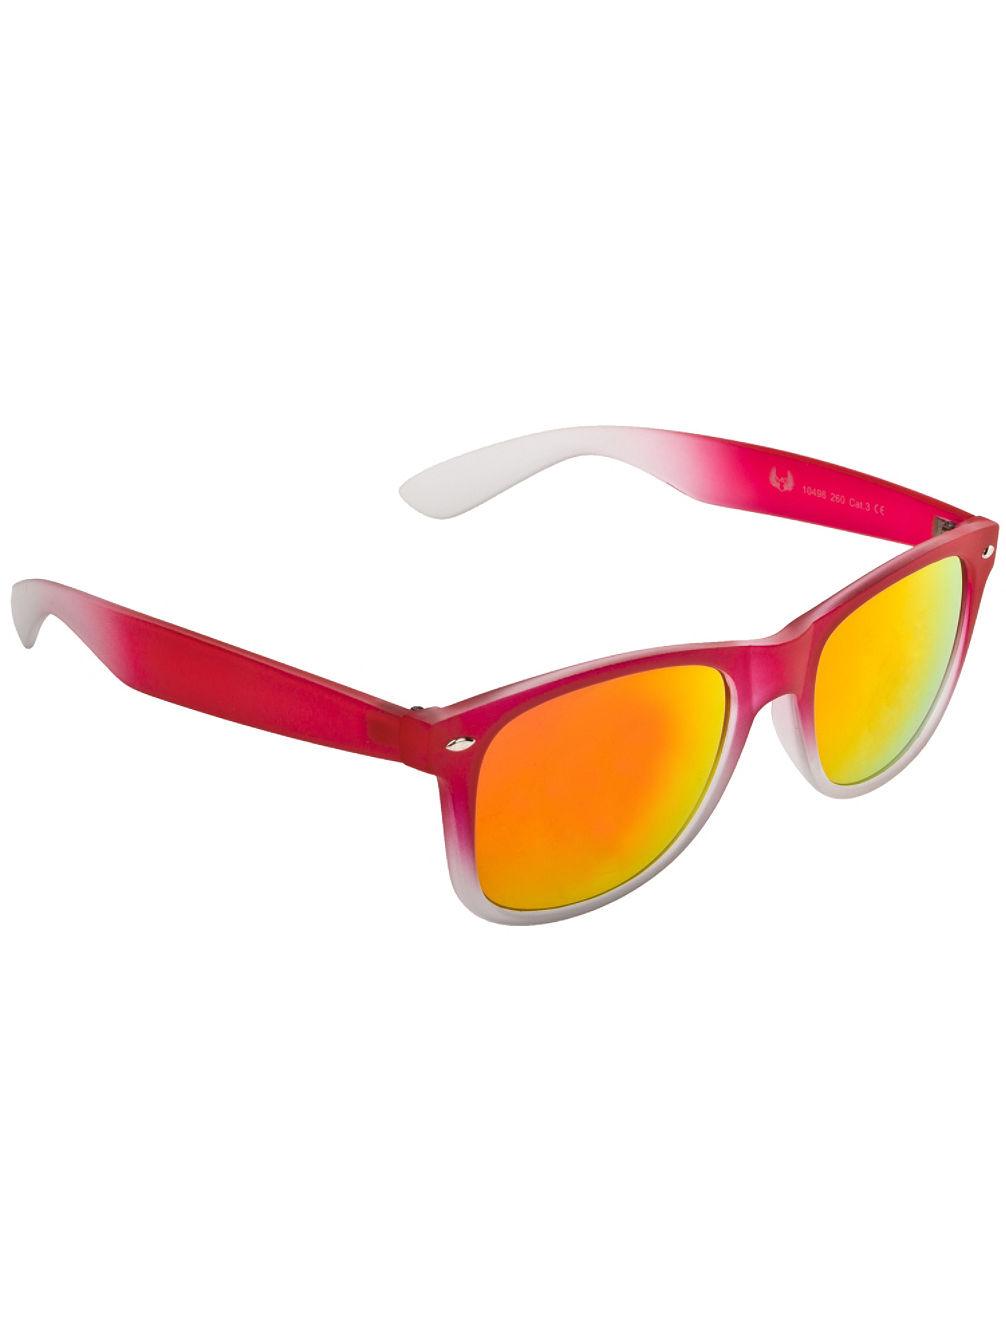 Buy MasterDis Likoma Fade Mirror Red online at blue-tomato.com 30575115dea